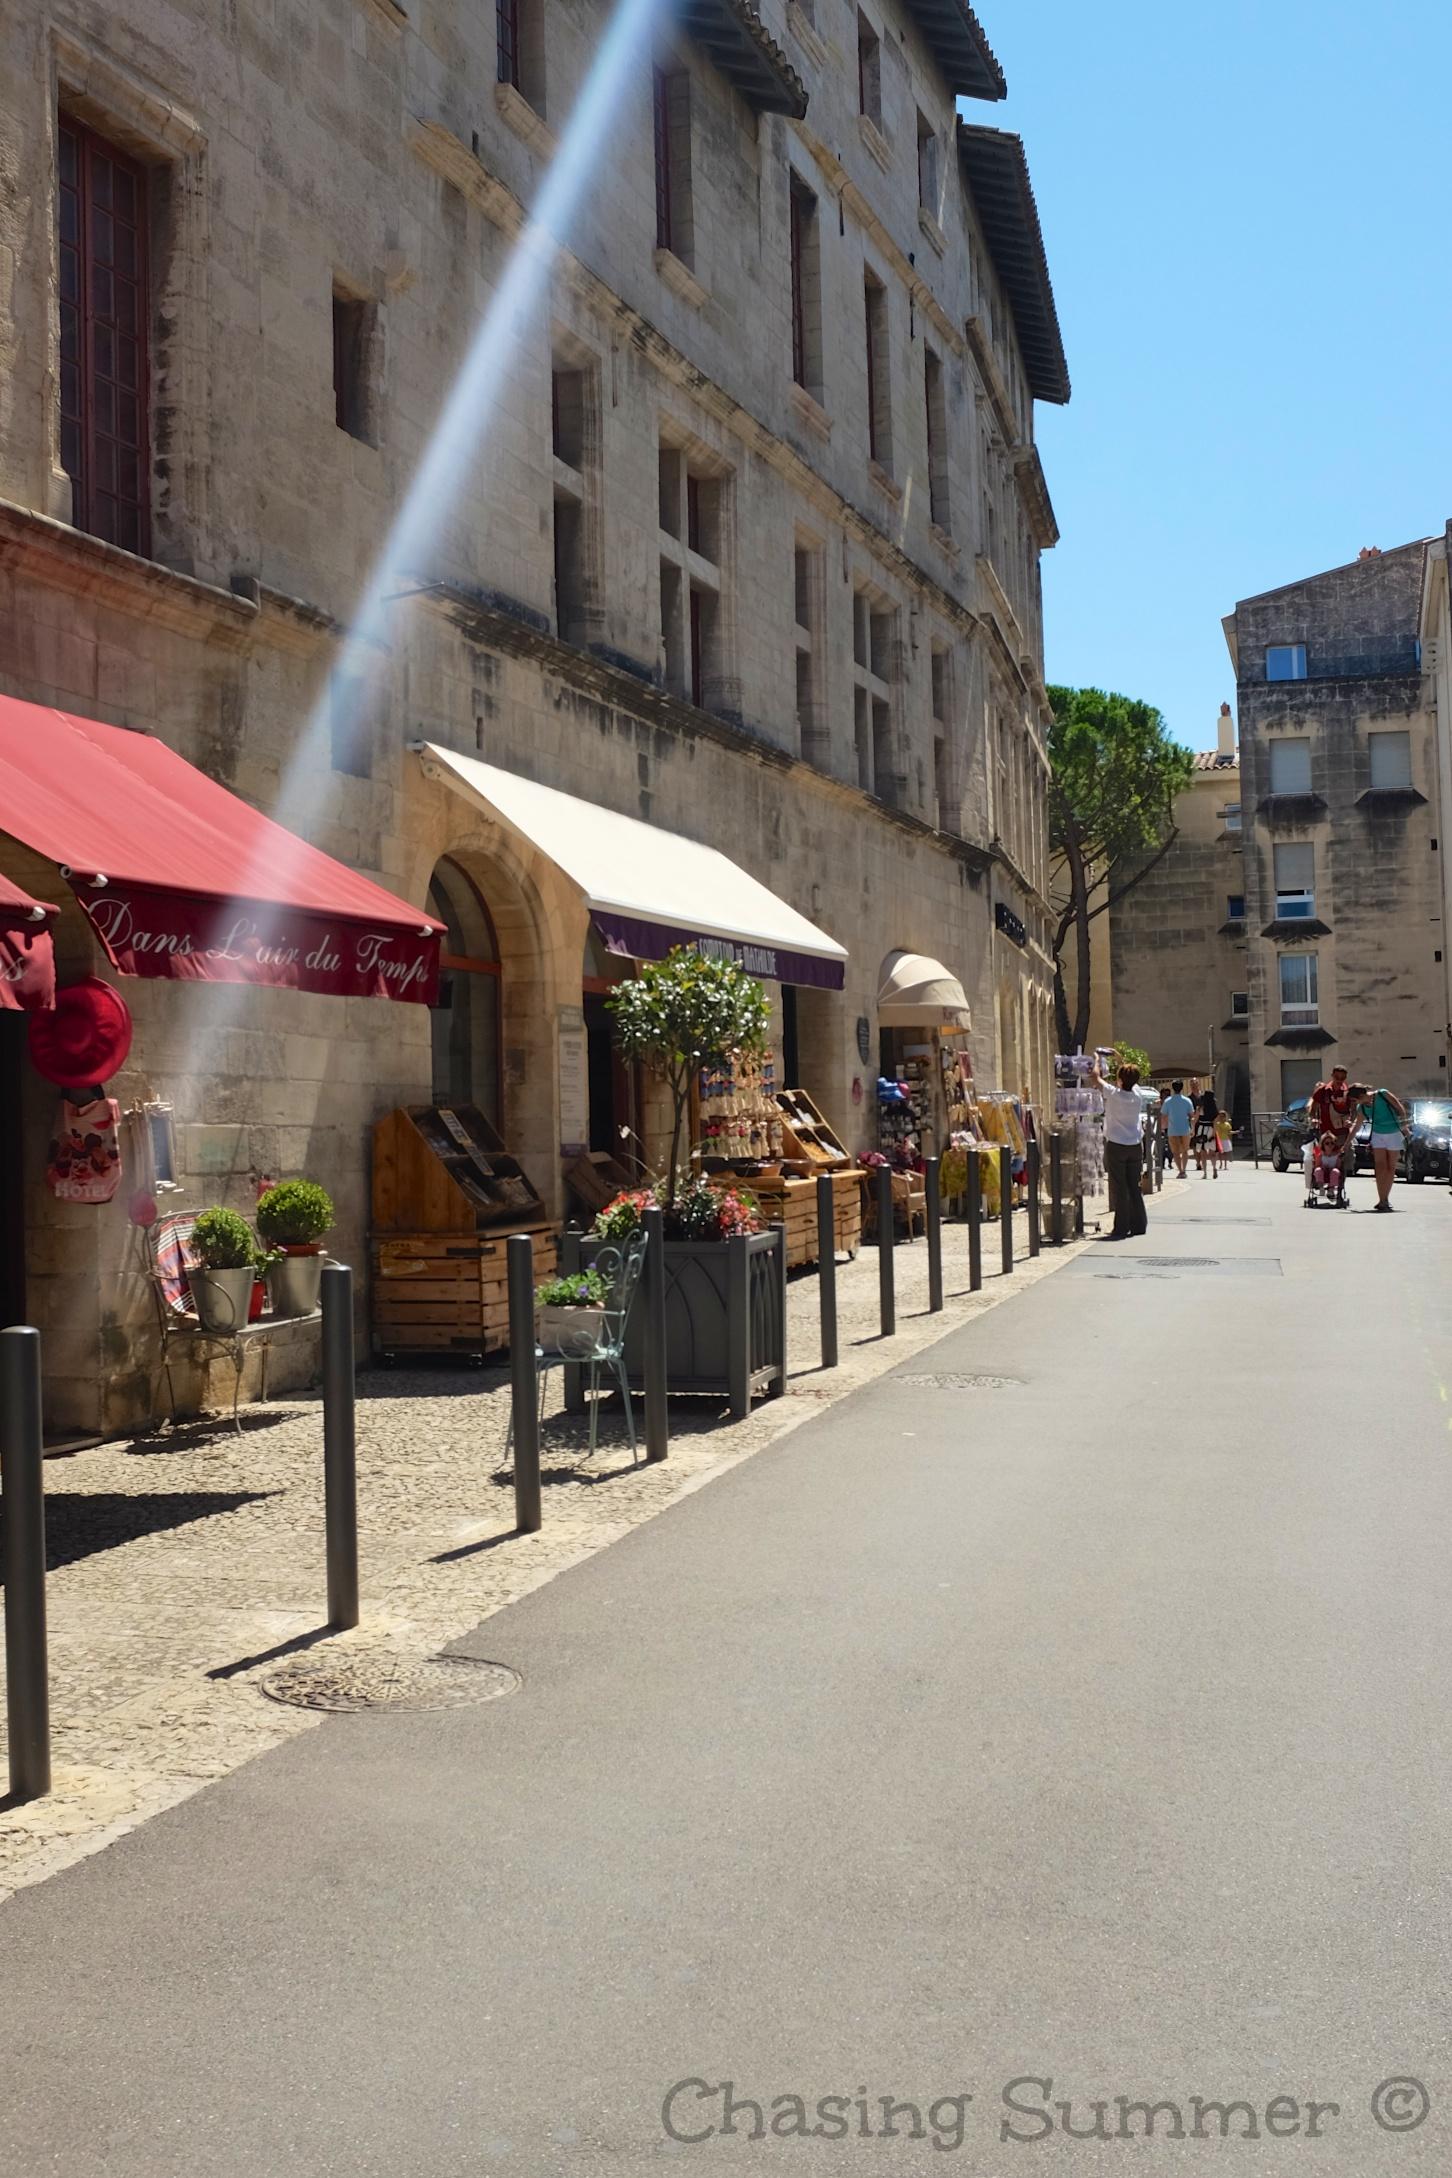 Charming streets of Avignon